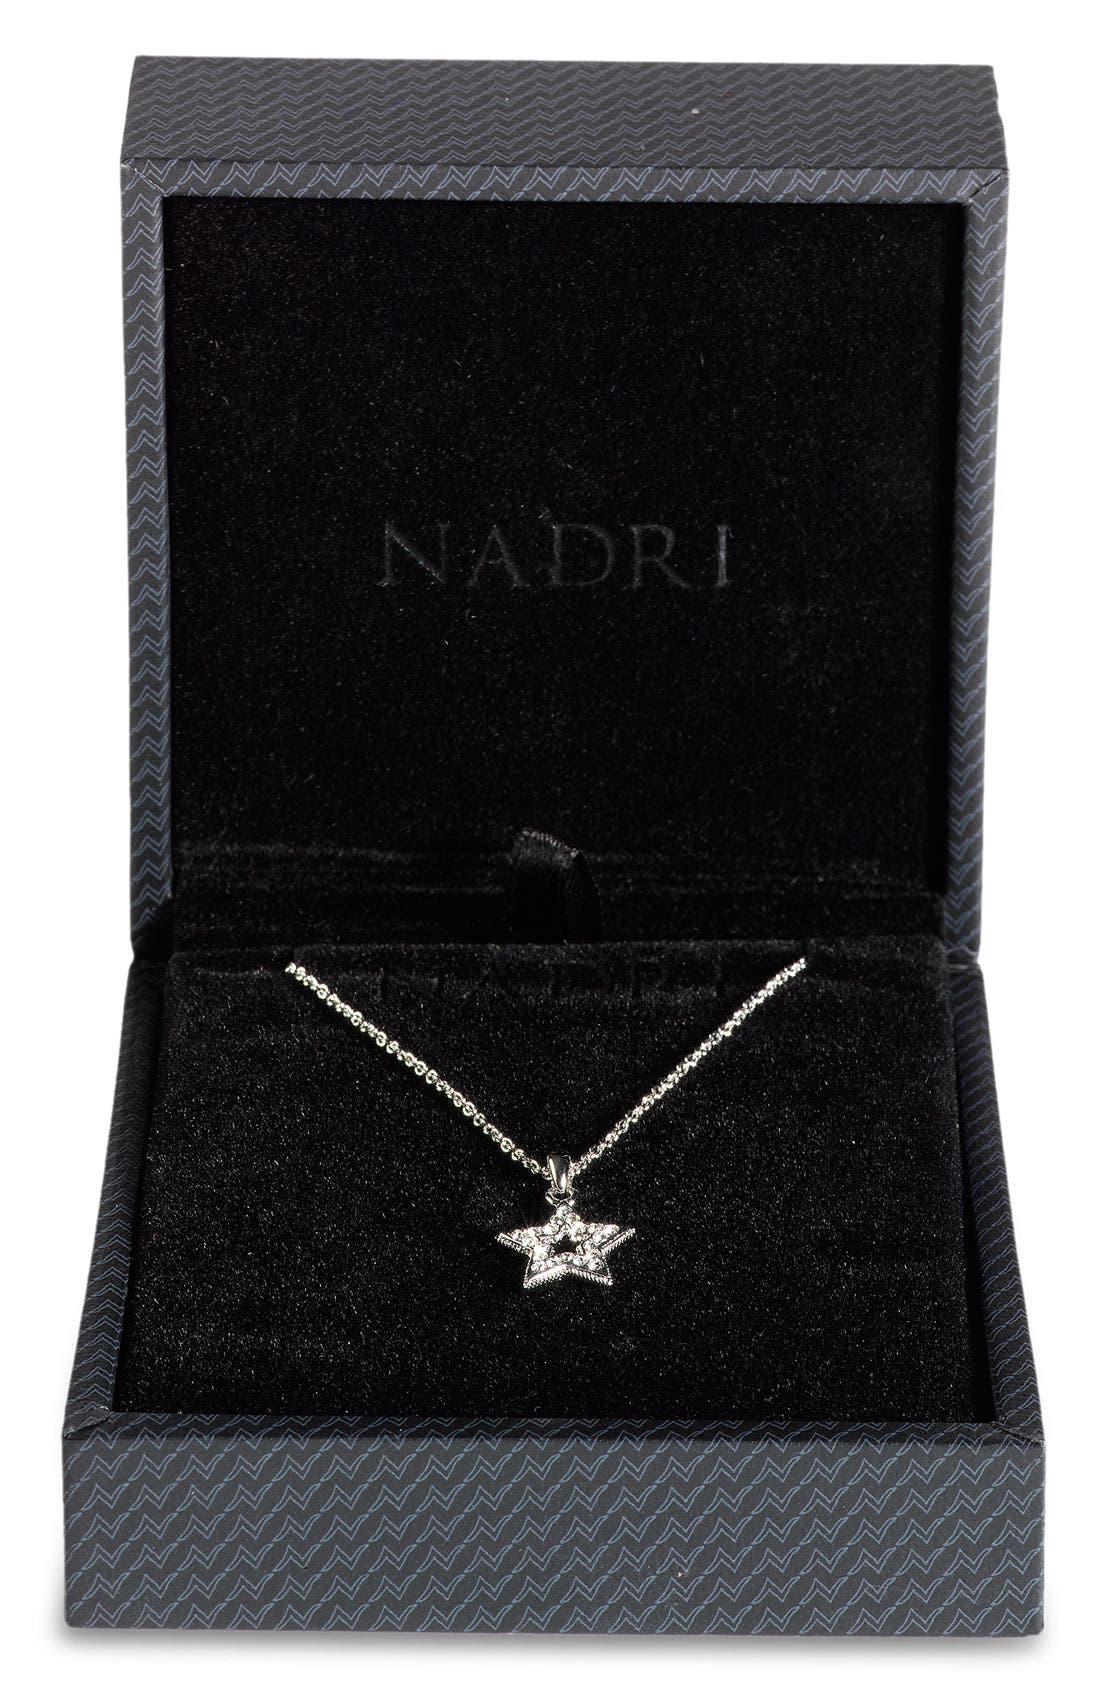 NADRI, Small Star Pendant Boxed Necklace, Alternate thumbnail 2, color, 040